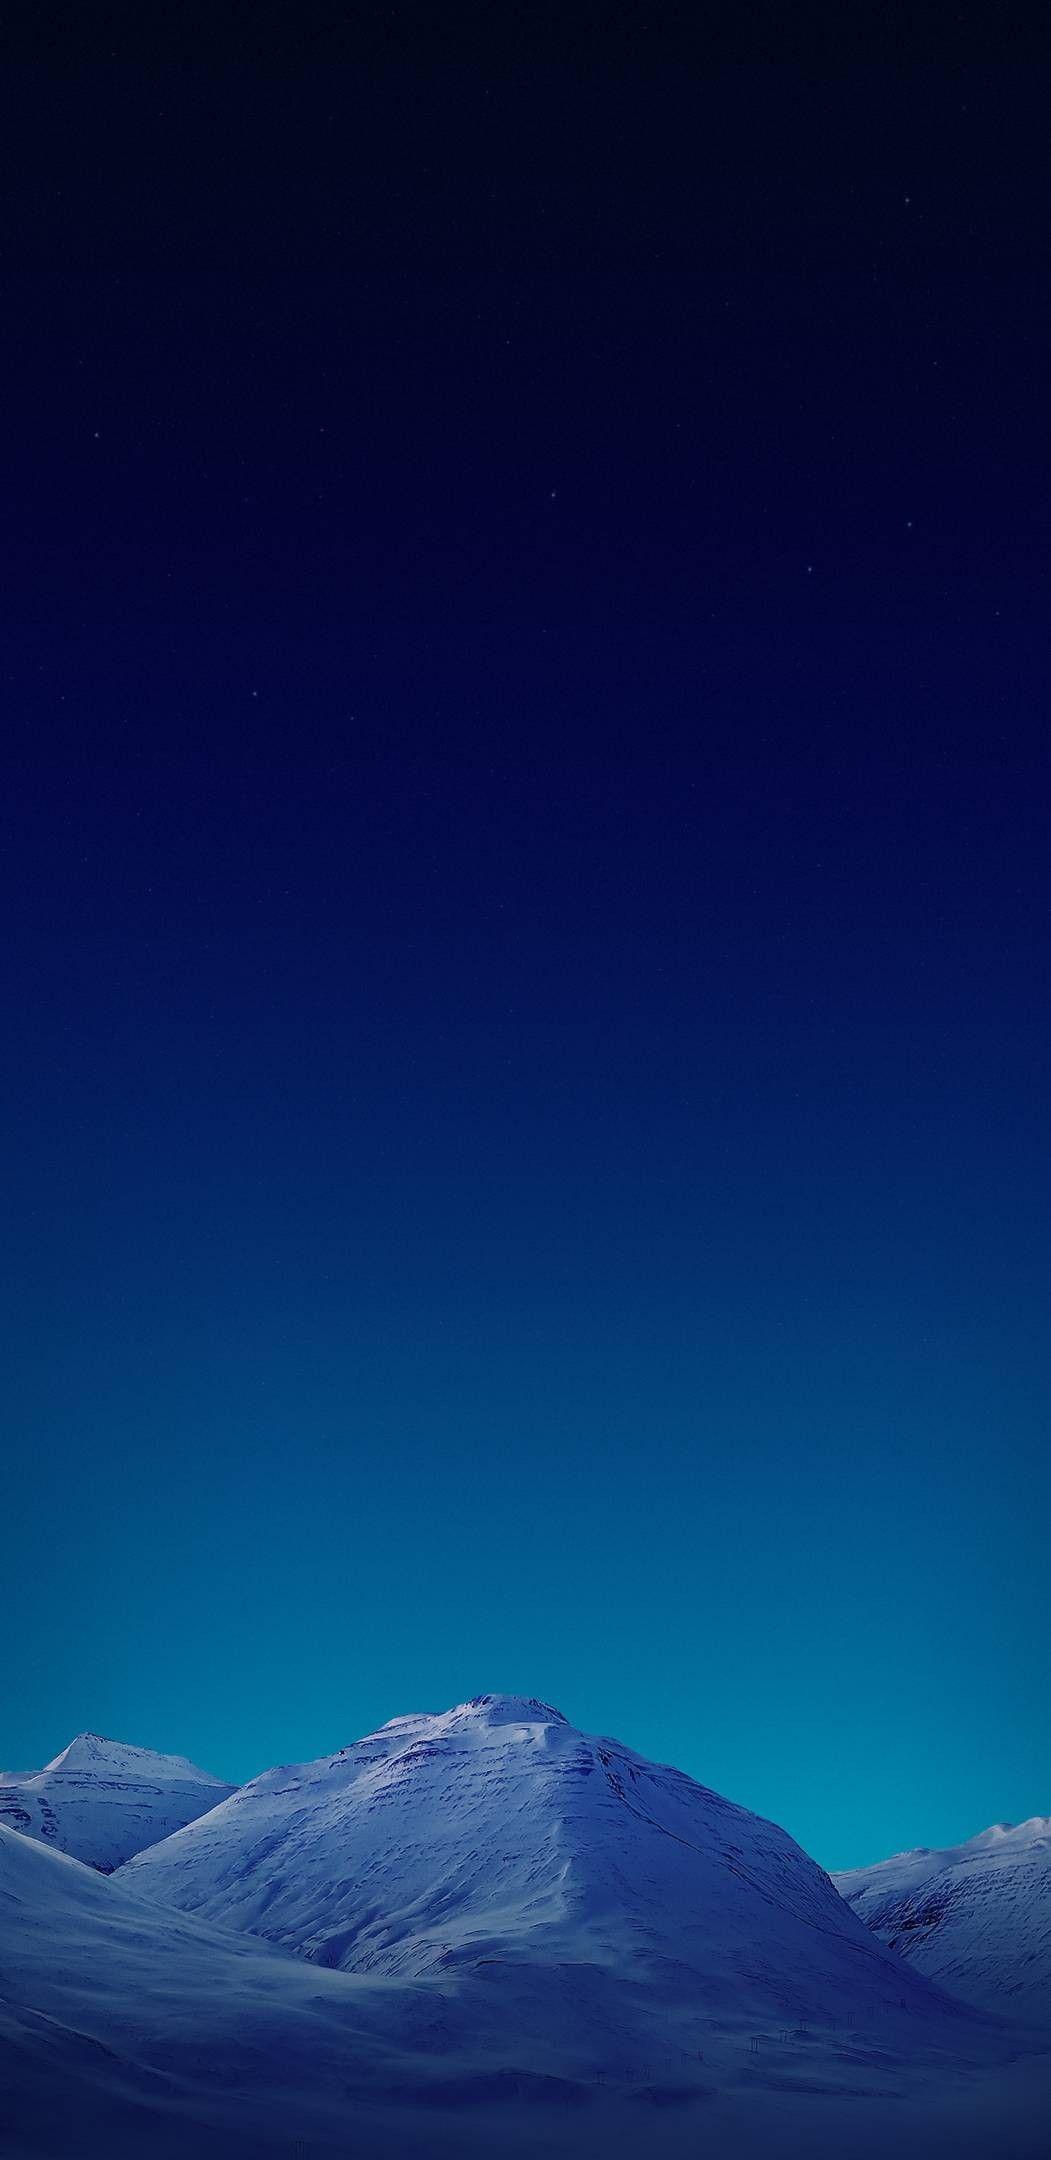 Night Sky Blue Mountain Wallpaper Clean Galaxy Colour